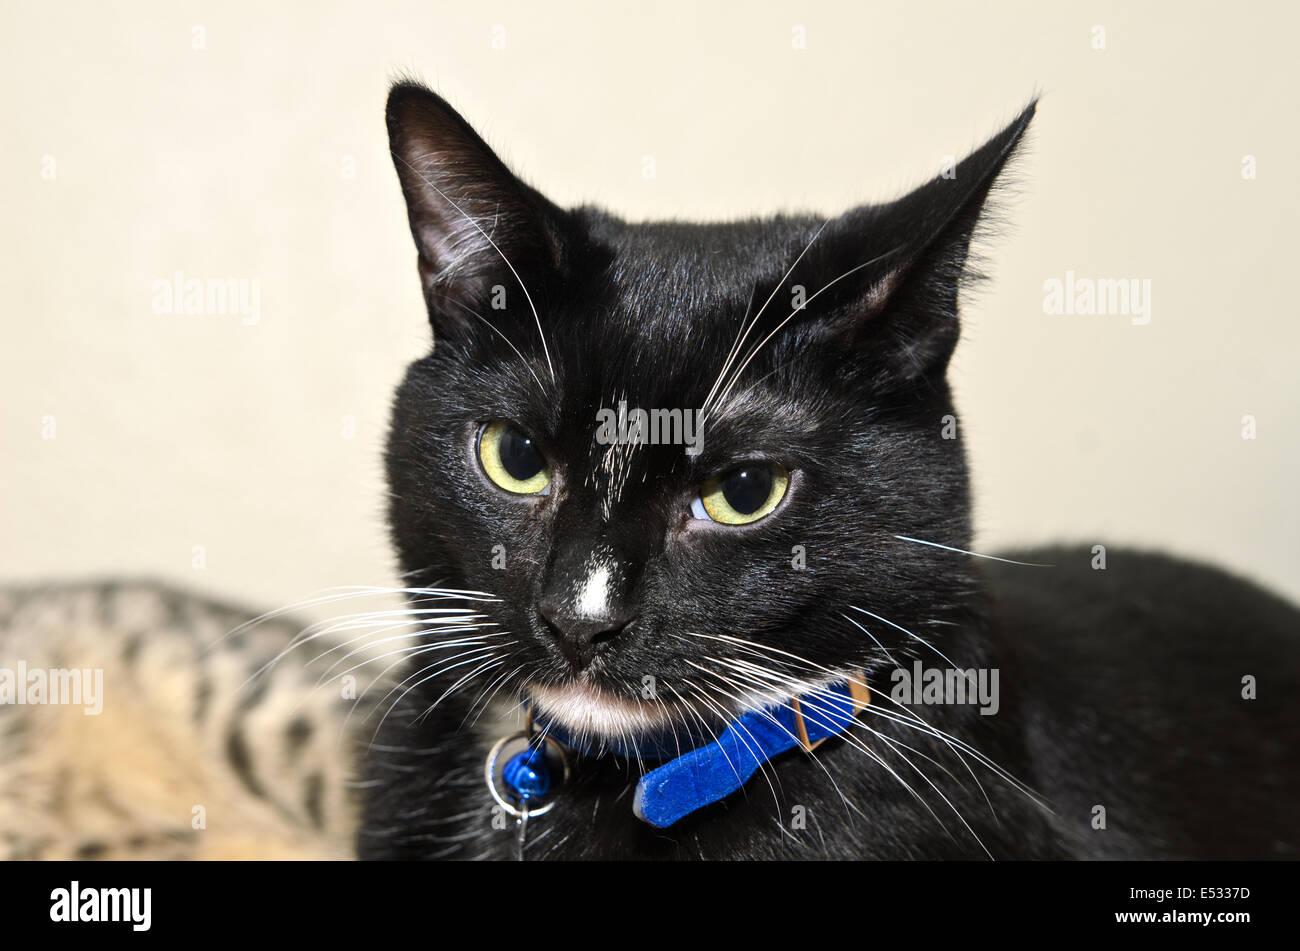 Face of black and white tuxedo cat - Stock Image